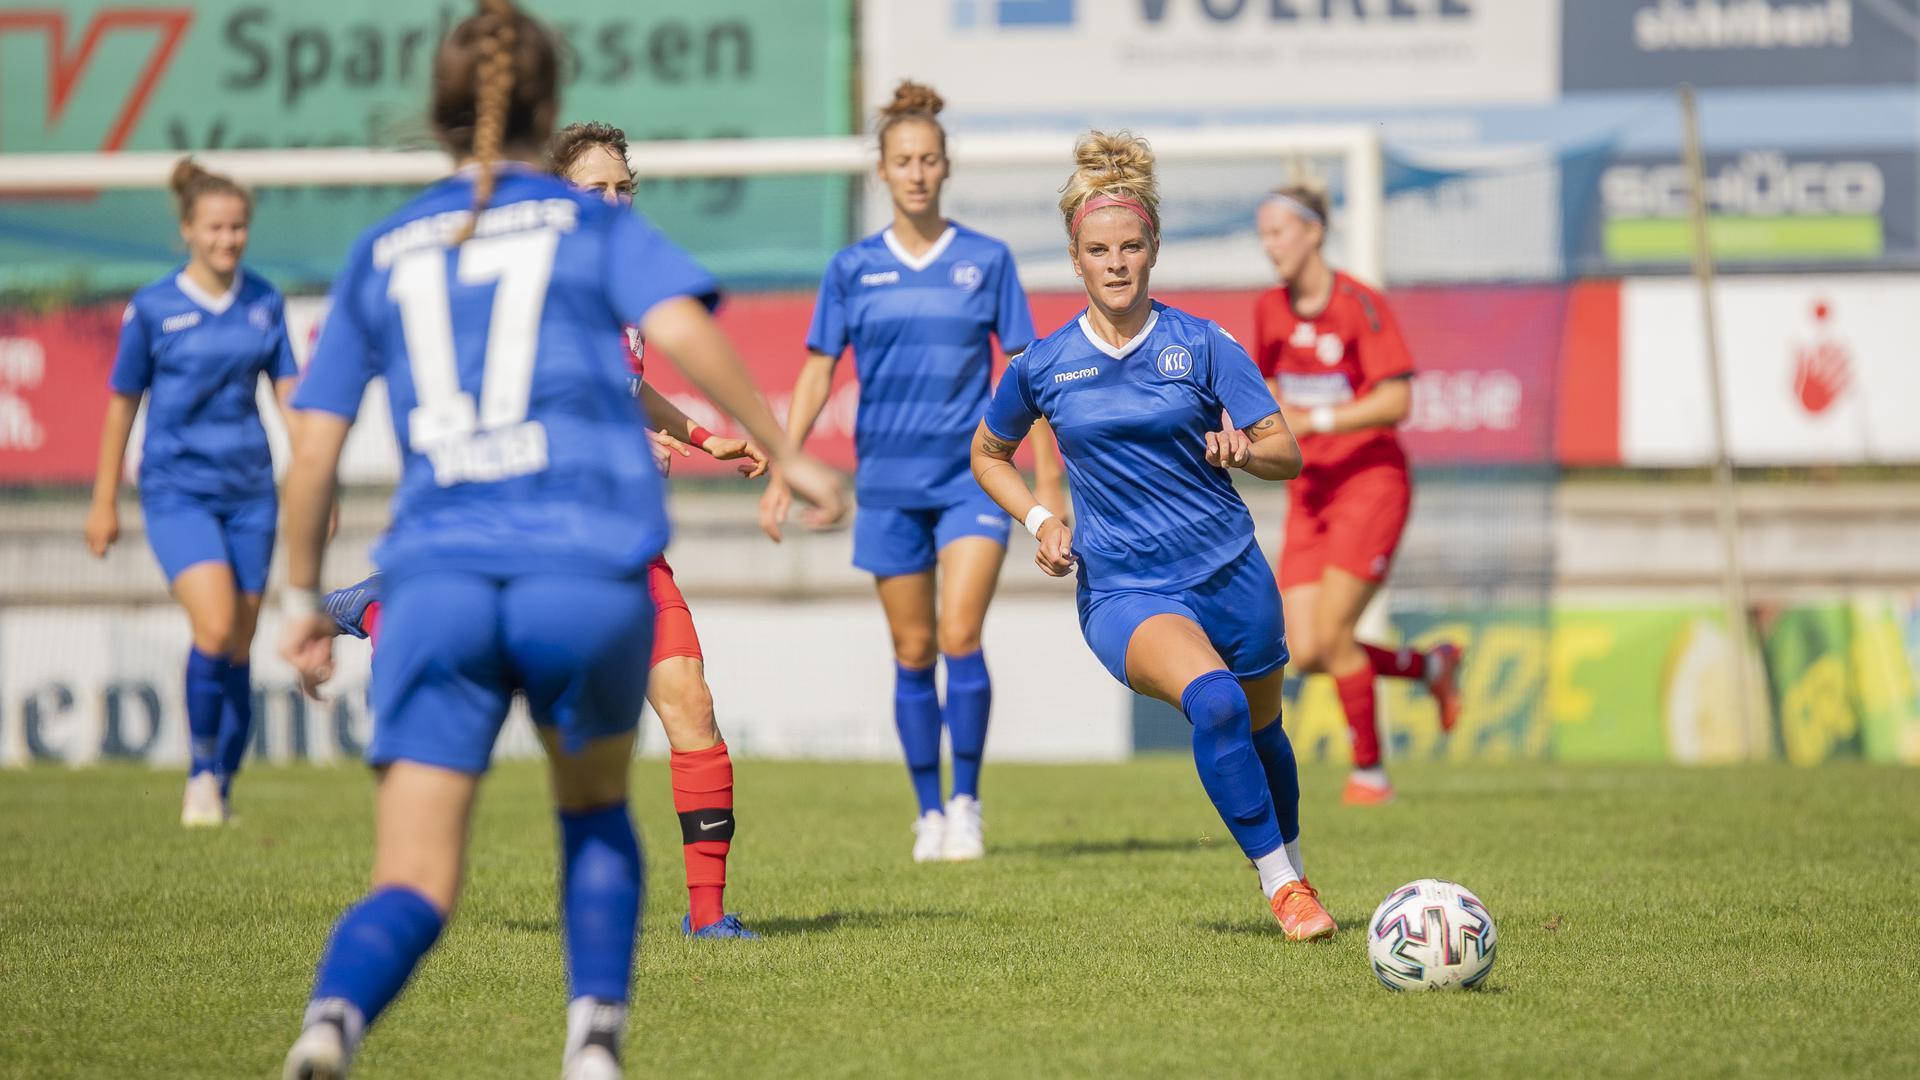 Foto: Simone Kochanek; Bruchsal; DEU; 19.09.2021; Fussball, Frauen RL Sued Staffel 1:  Karlsruher SC - SC Sand 2; im Bild: Nele Schomaker (Karlsruher SC, #7)